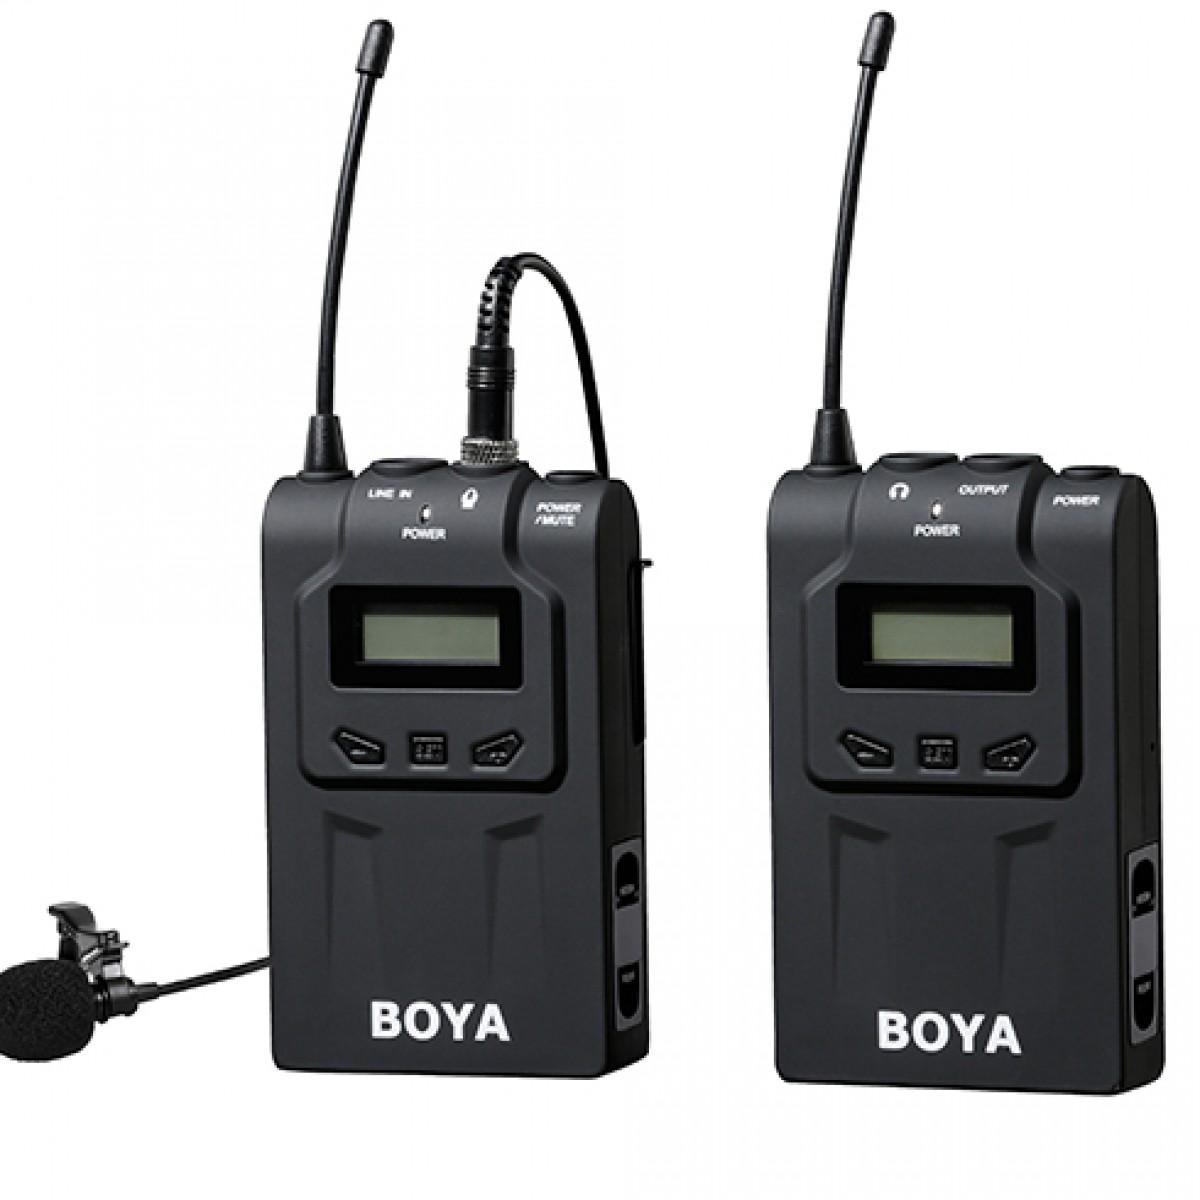 boya-by-wm6-wireless-audio-sender-receiver-lavalier-microphone-100m-range-mic